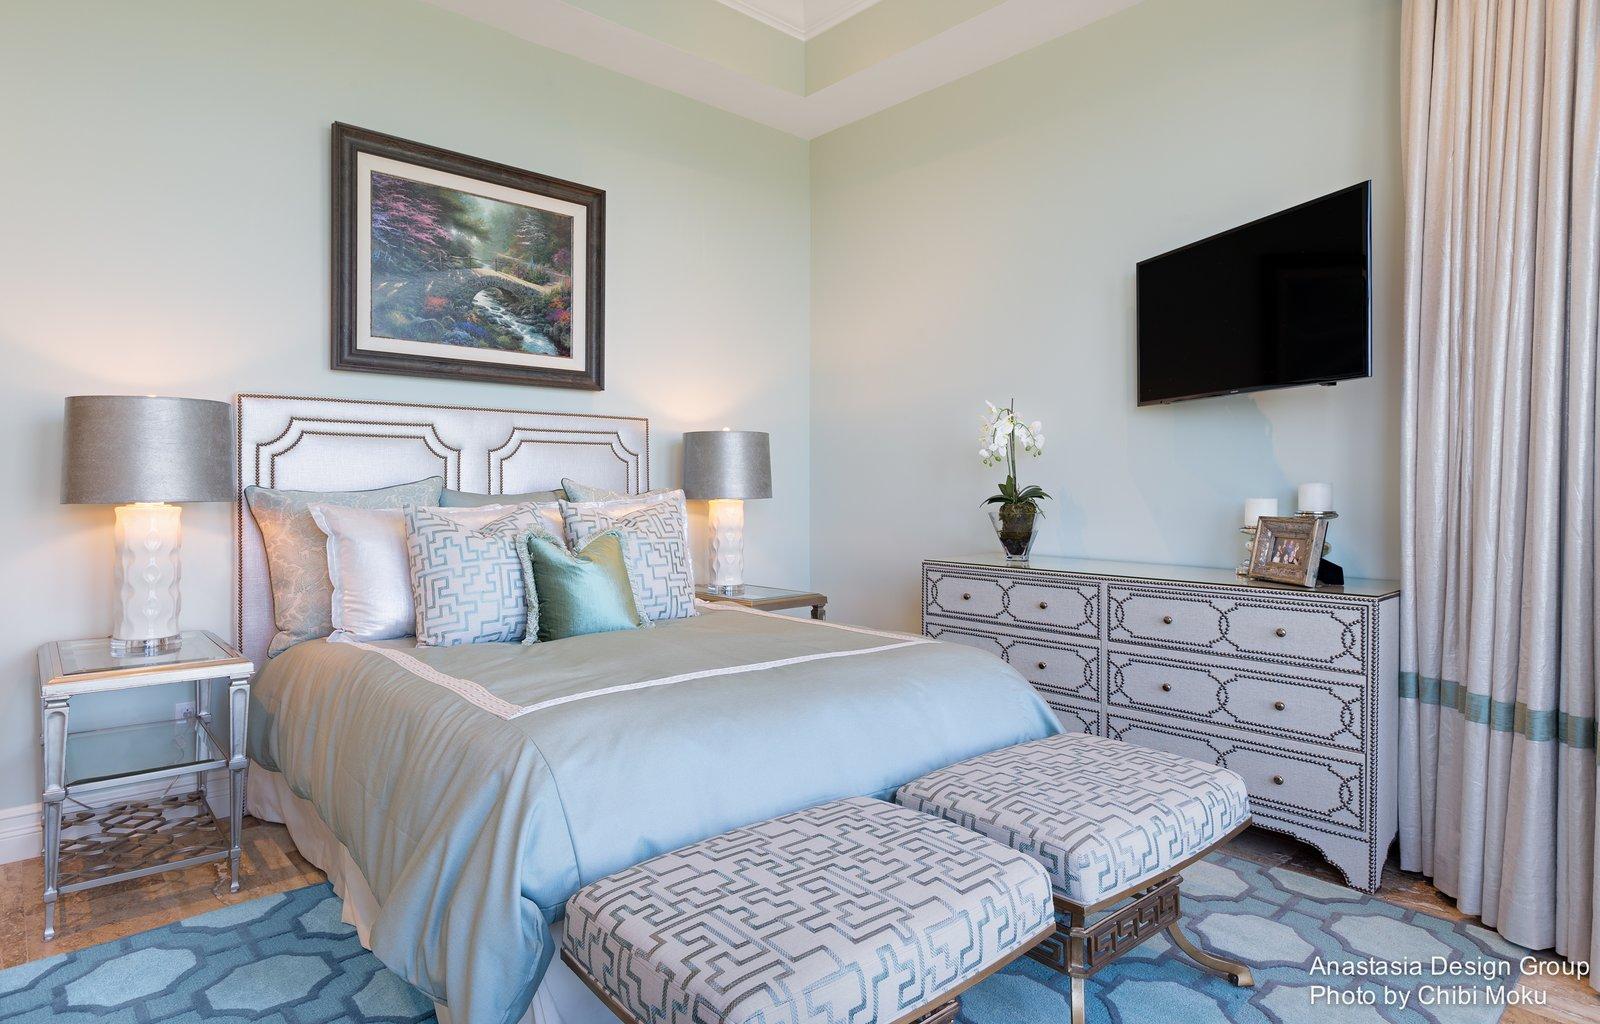 Architecture Spotlight #82   Palm Coast Paradise by Anastasia Design Group   Palm Coast, FL by Chibi Moku